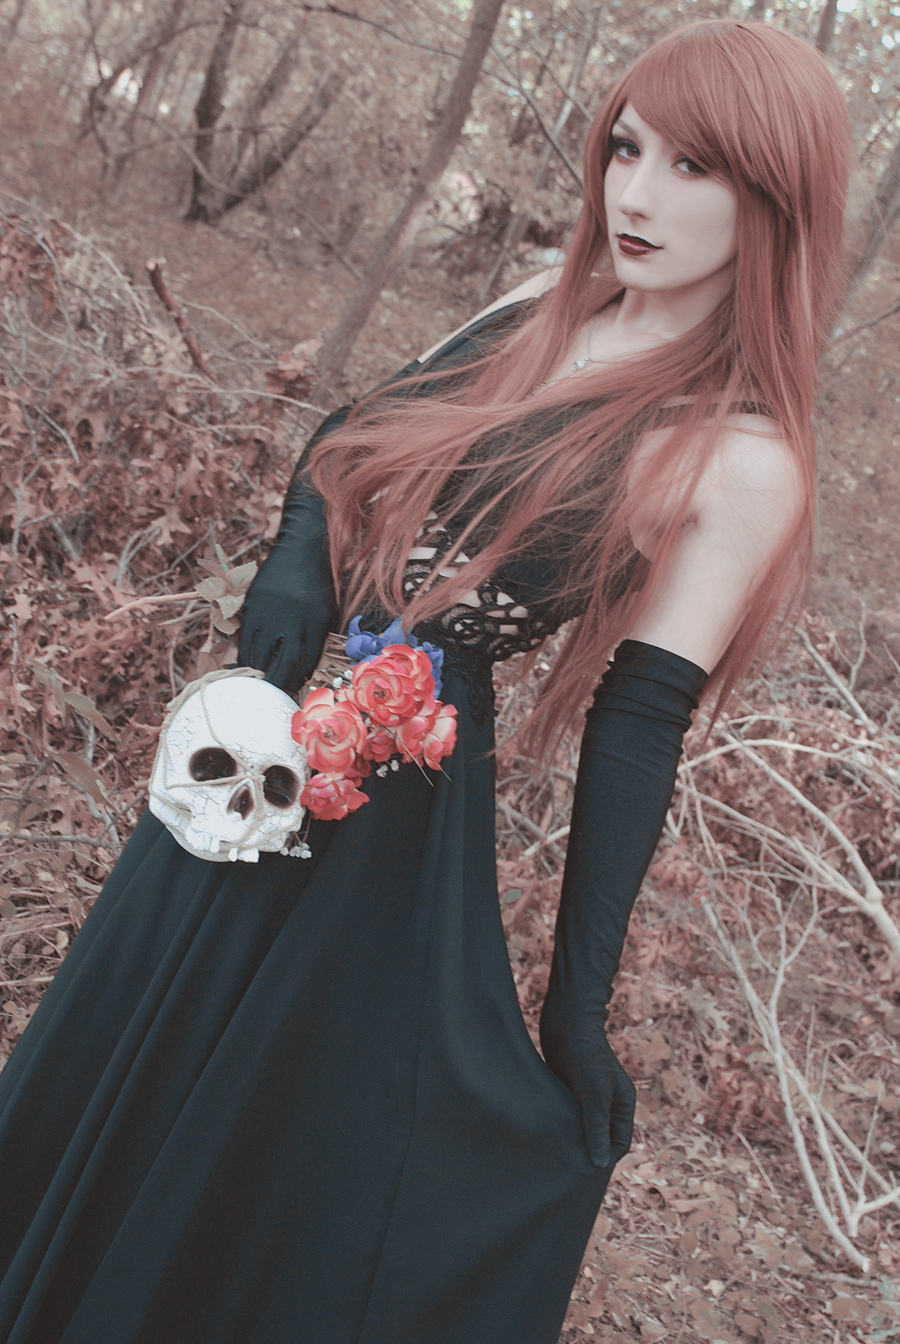 Autumn Vampire 2 by x-Marionette-x